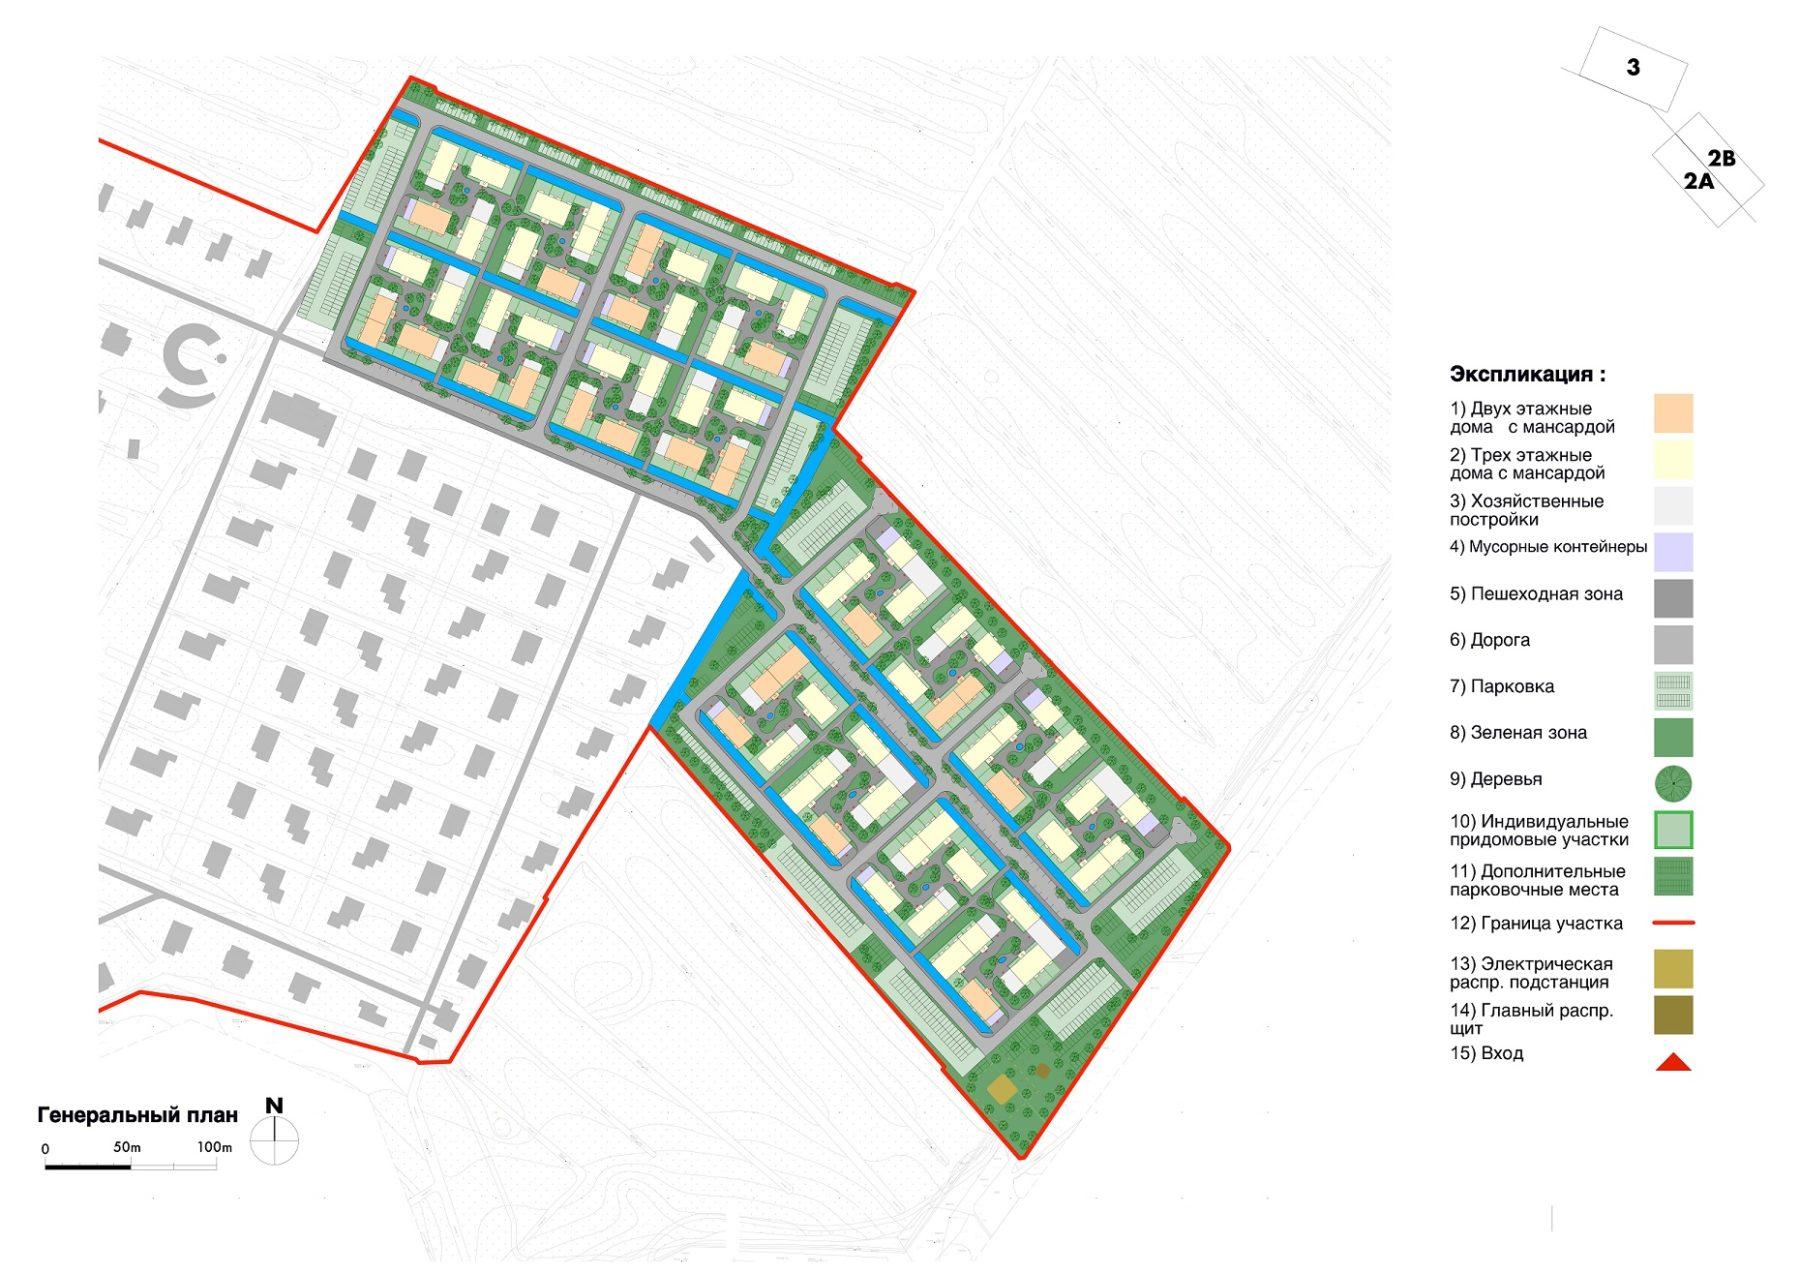 Мастер-план коттеджного поселка